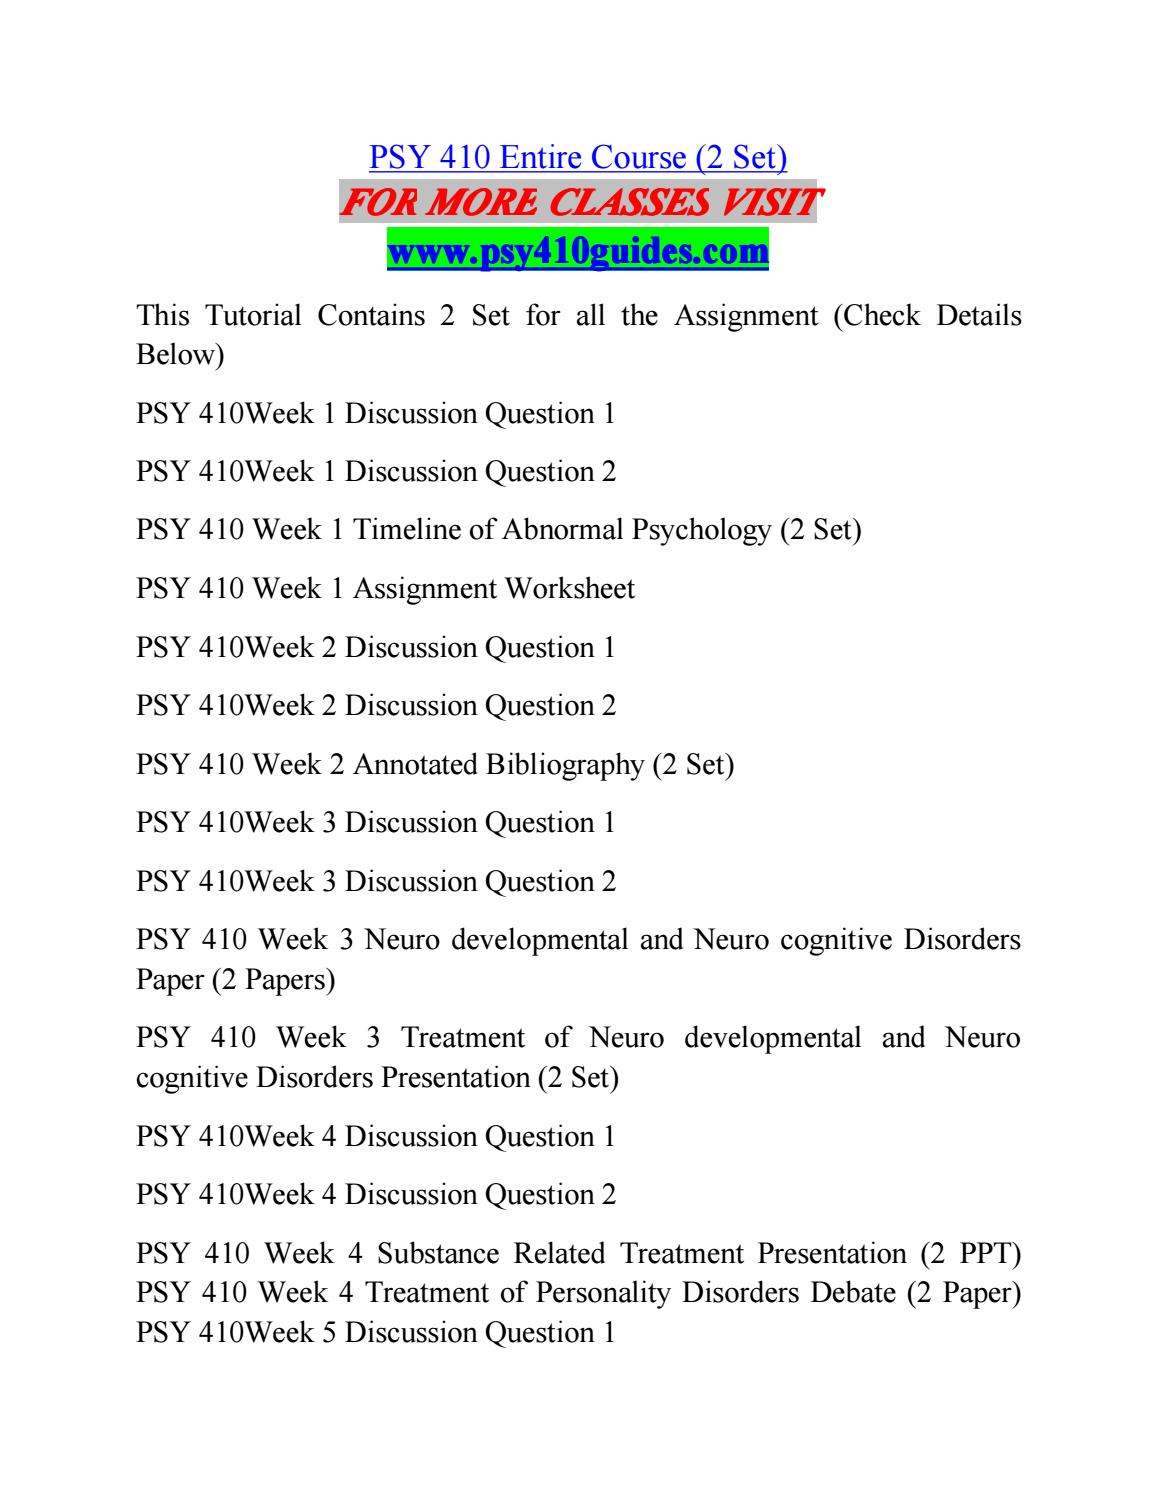 worksheet Psychology Timeline Worksheet psy 410 guides expert study psy410guides com by jonathankillian81 issuu